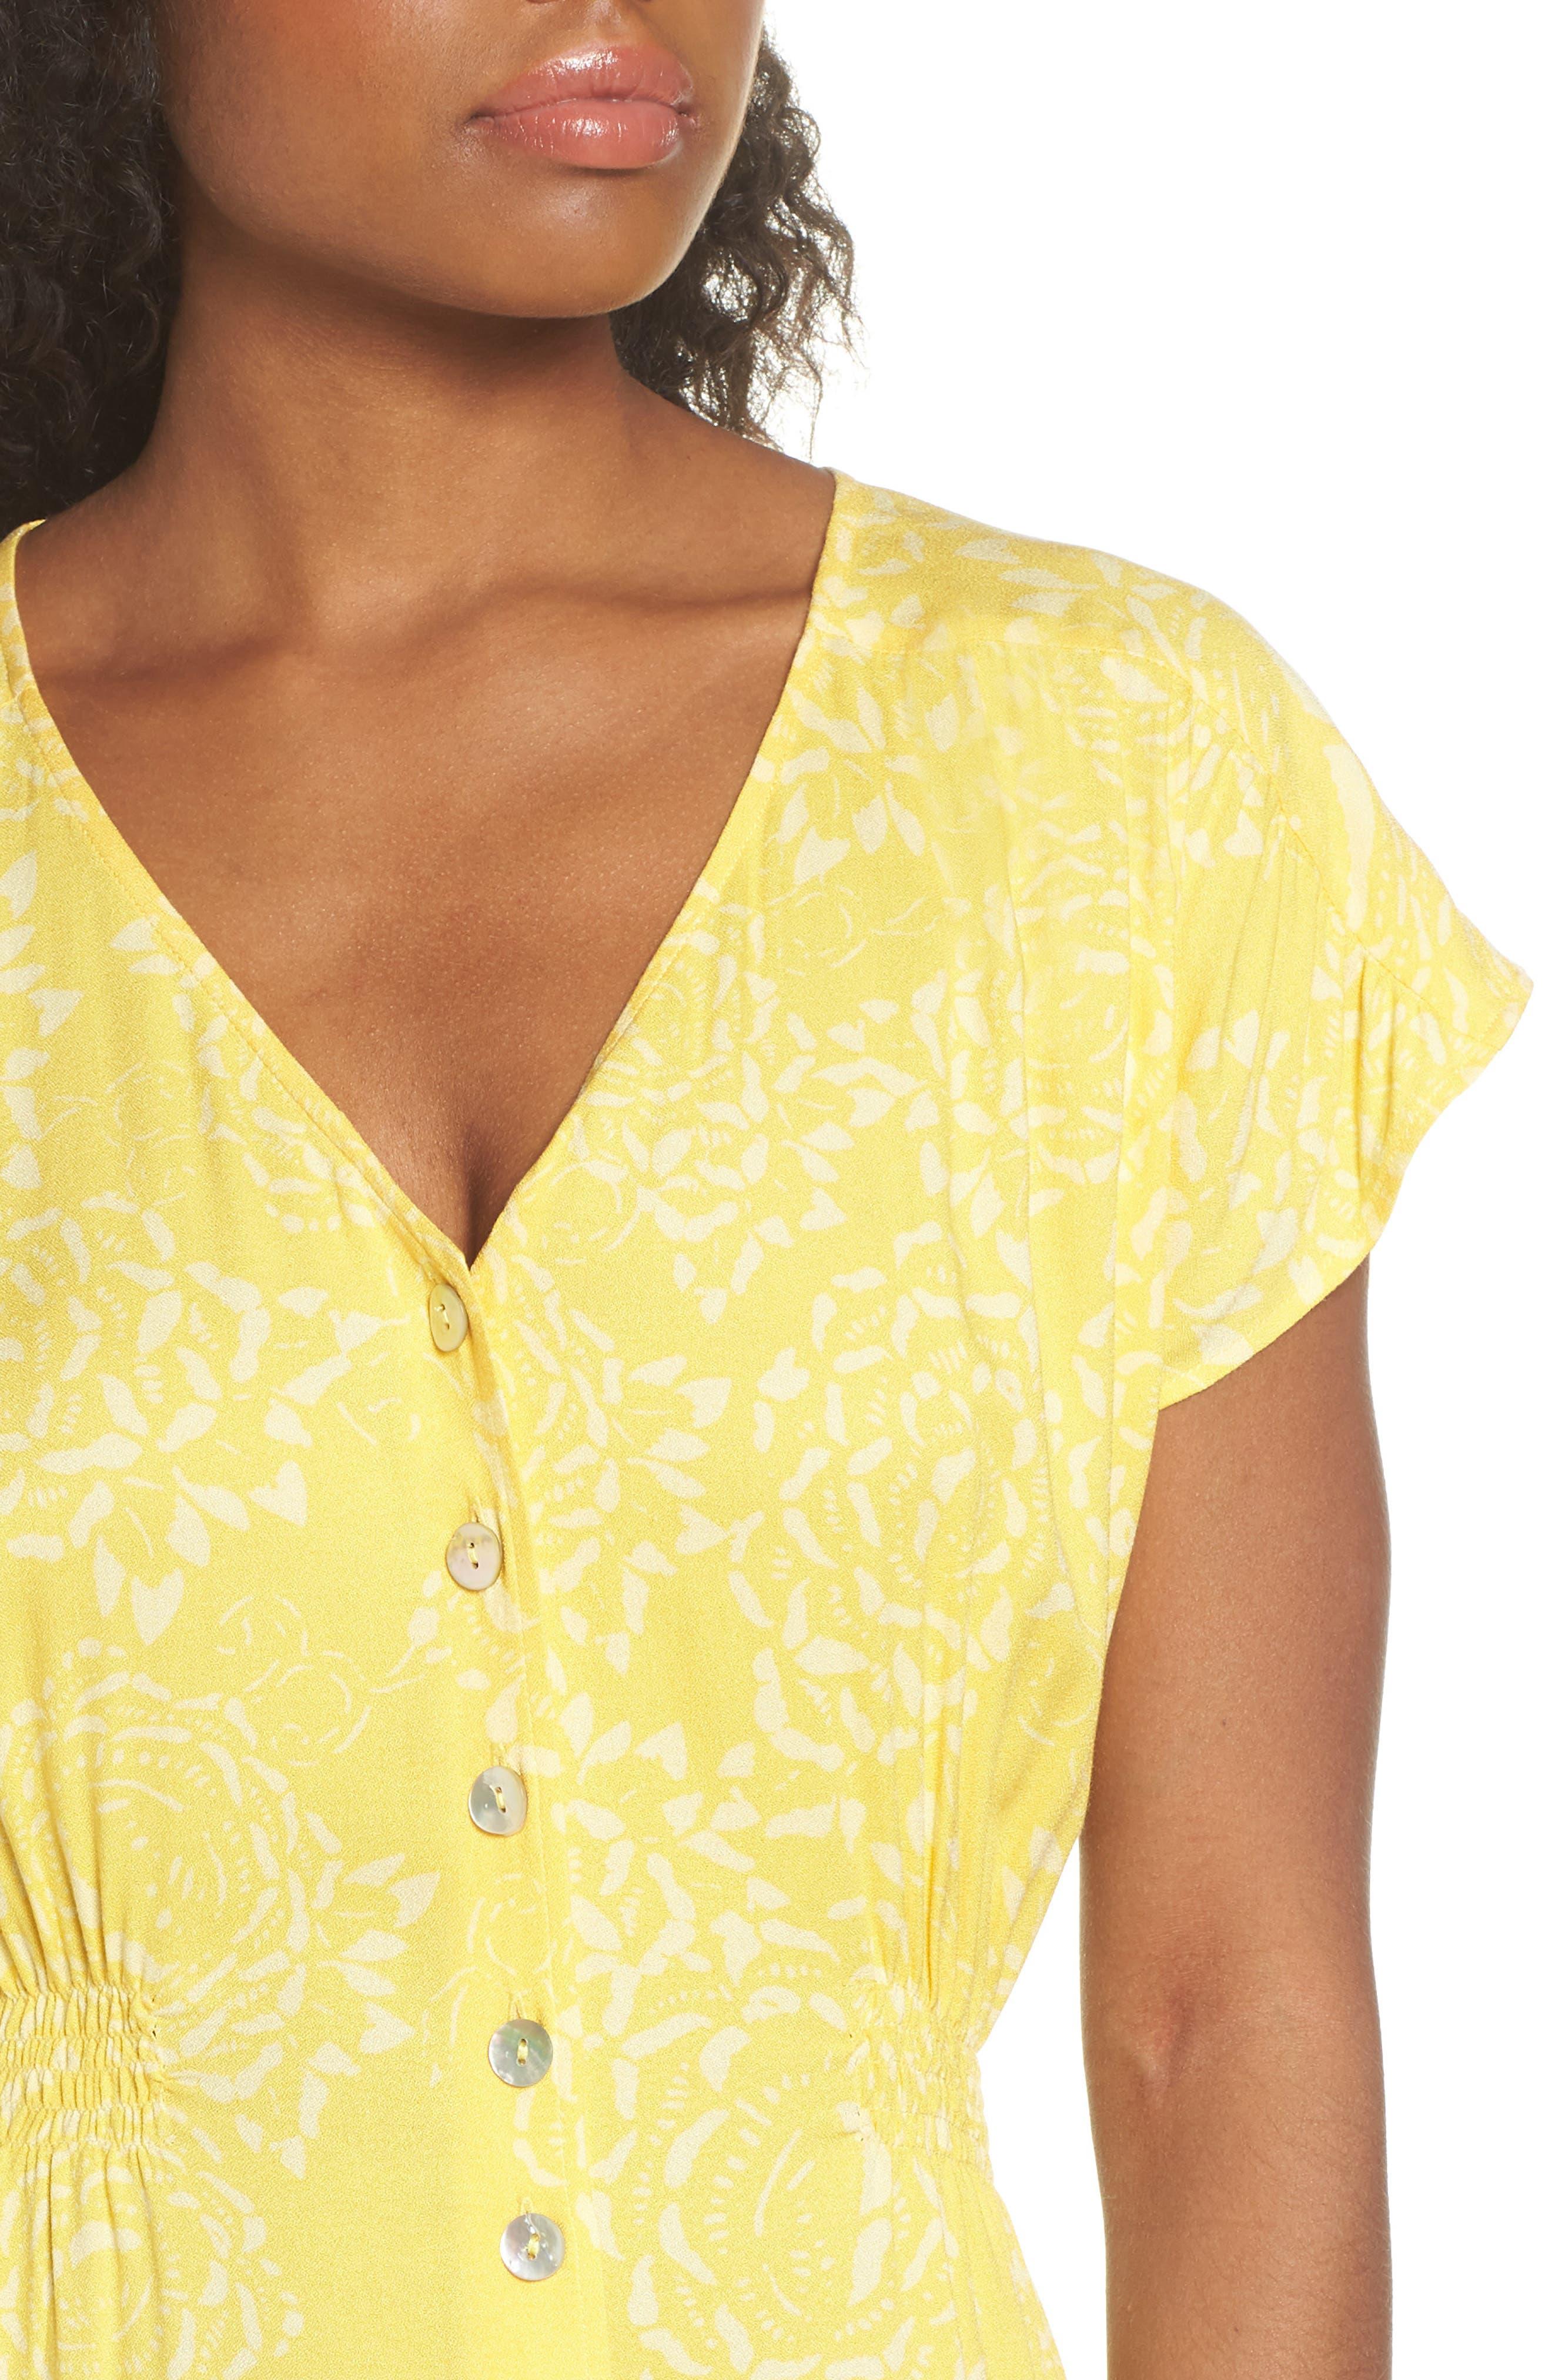 Lido Front Button Sheath Dress,                             Alternate thumbnail 4, color,                             707